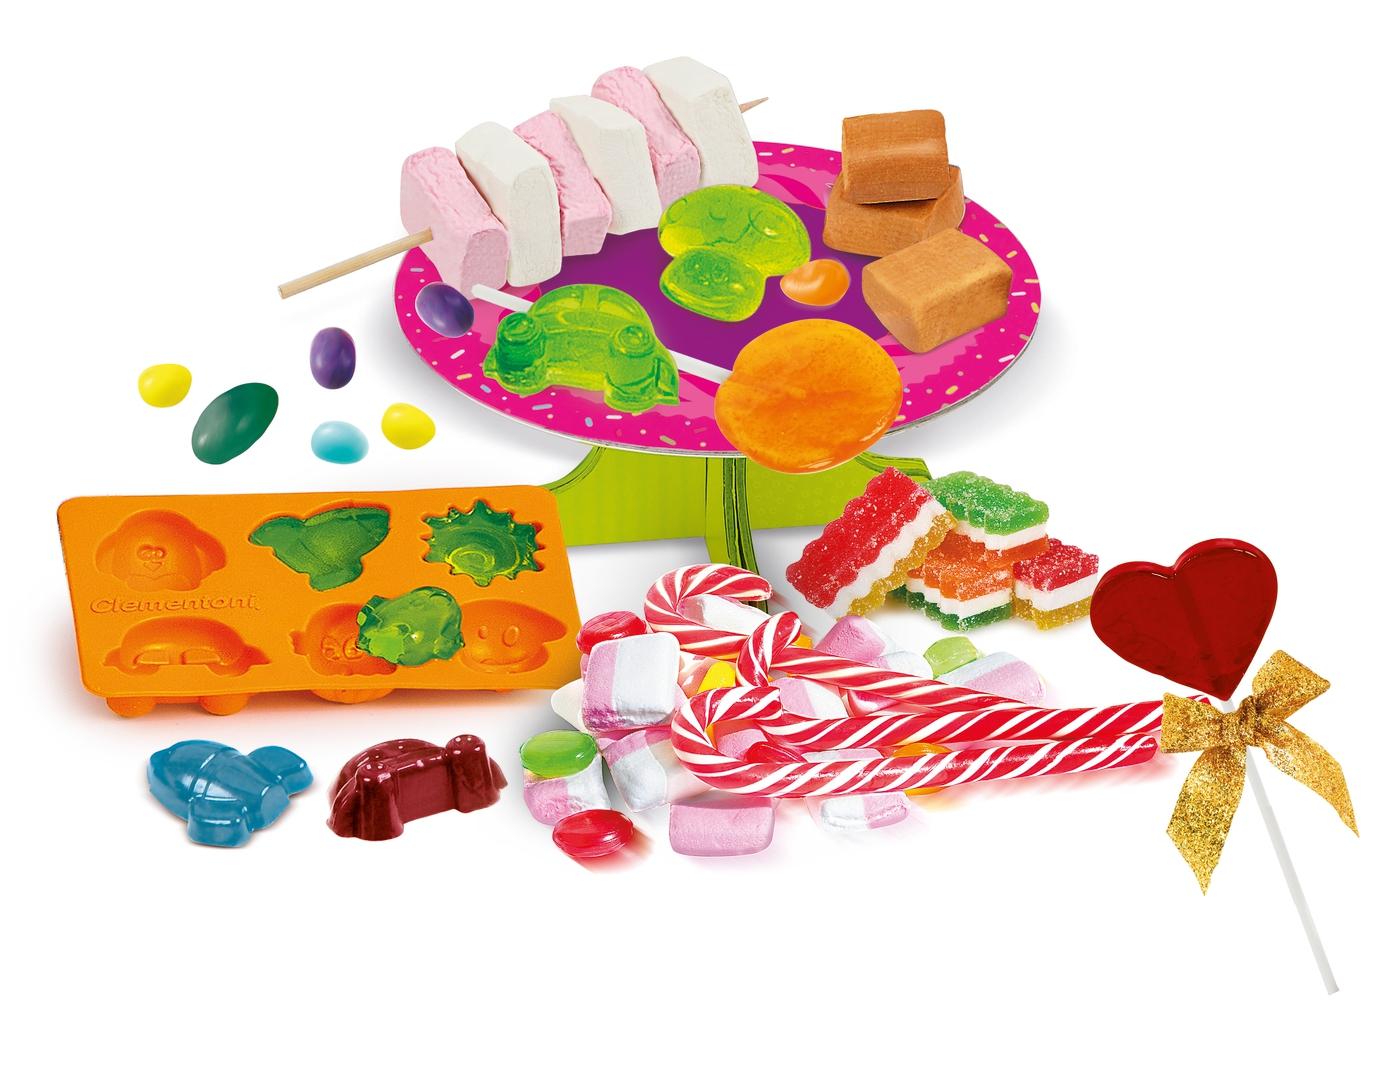 Clementoni - 19129 - caramelle e bonbons -